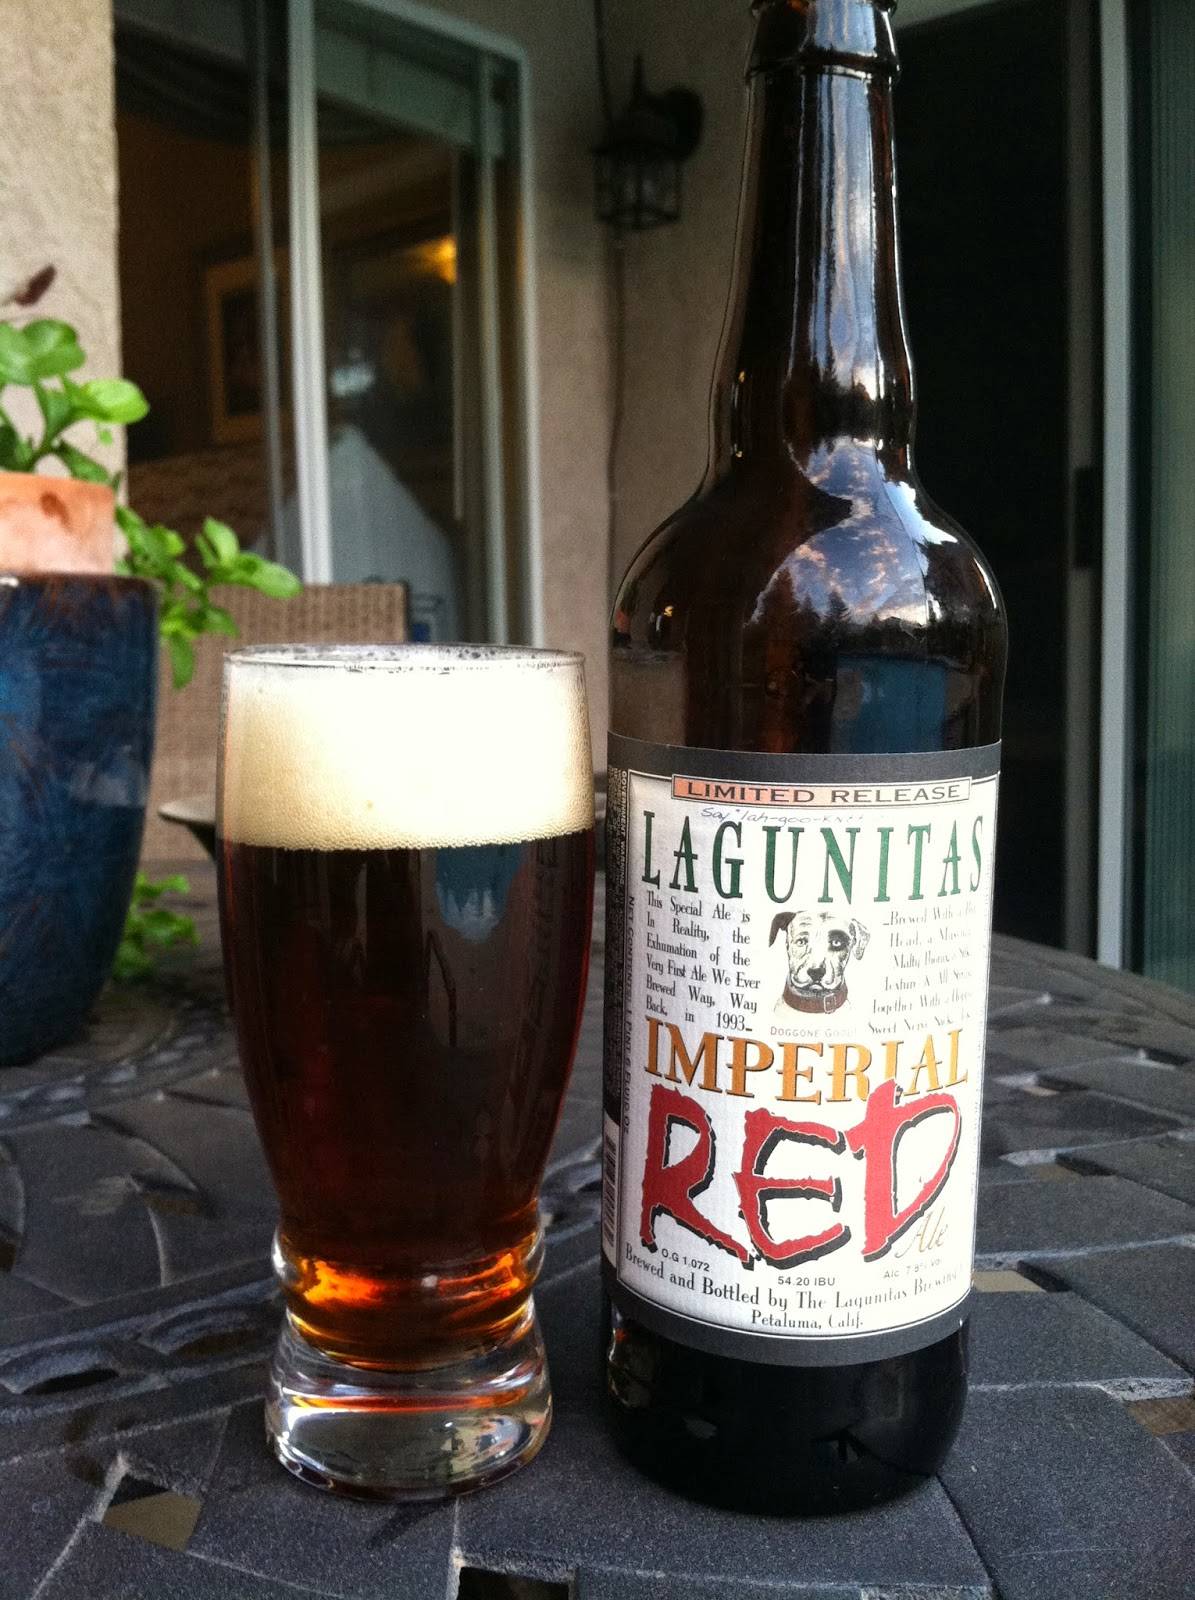 Lagunitas Imperial Red Ale 1